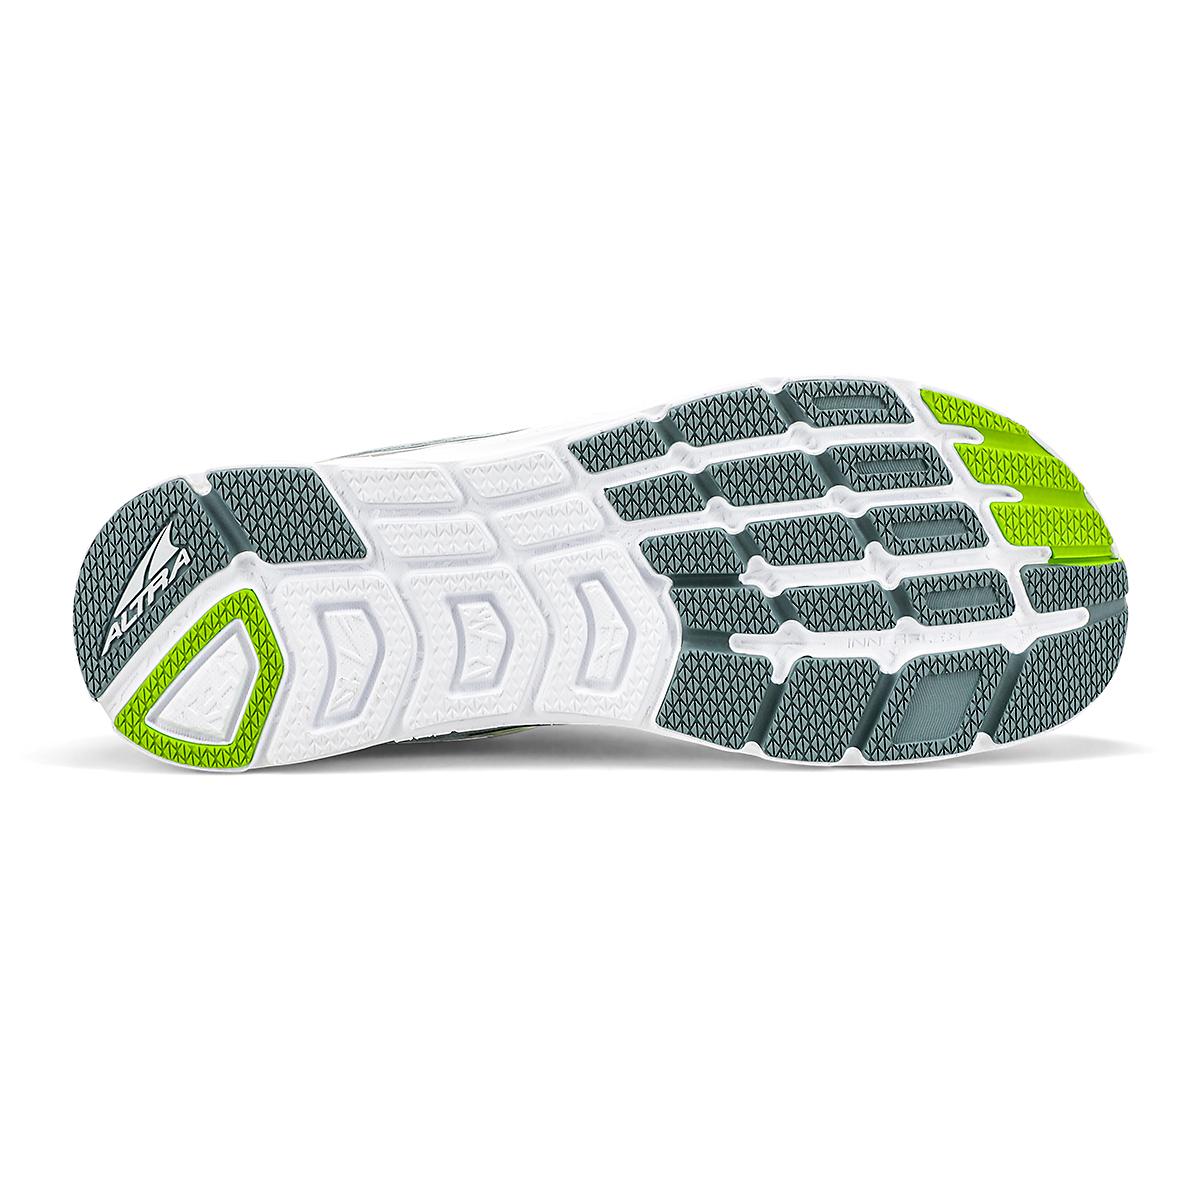 Men's Altra Rivera Running Shoe - Color: Green - Size: 7 - Width: Regular, Green, large, image 4